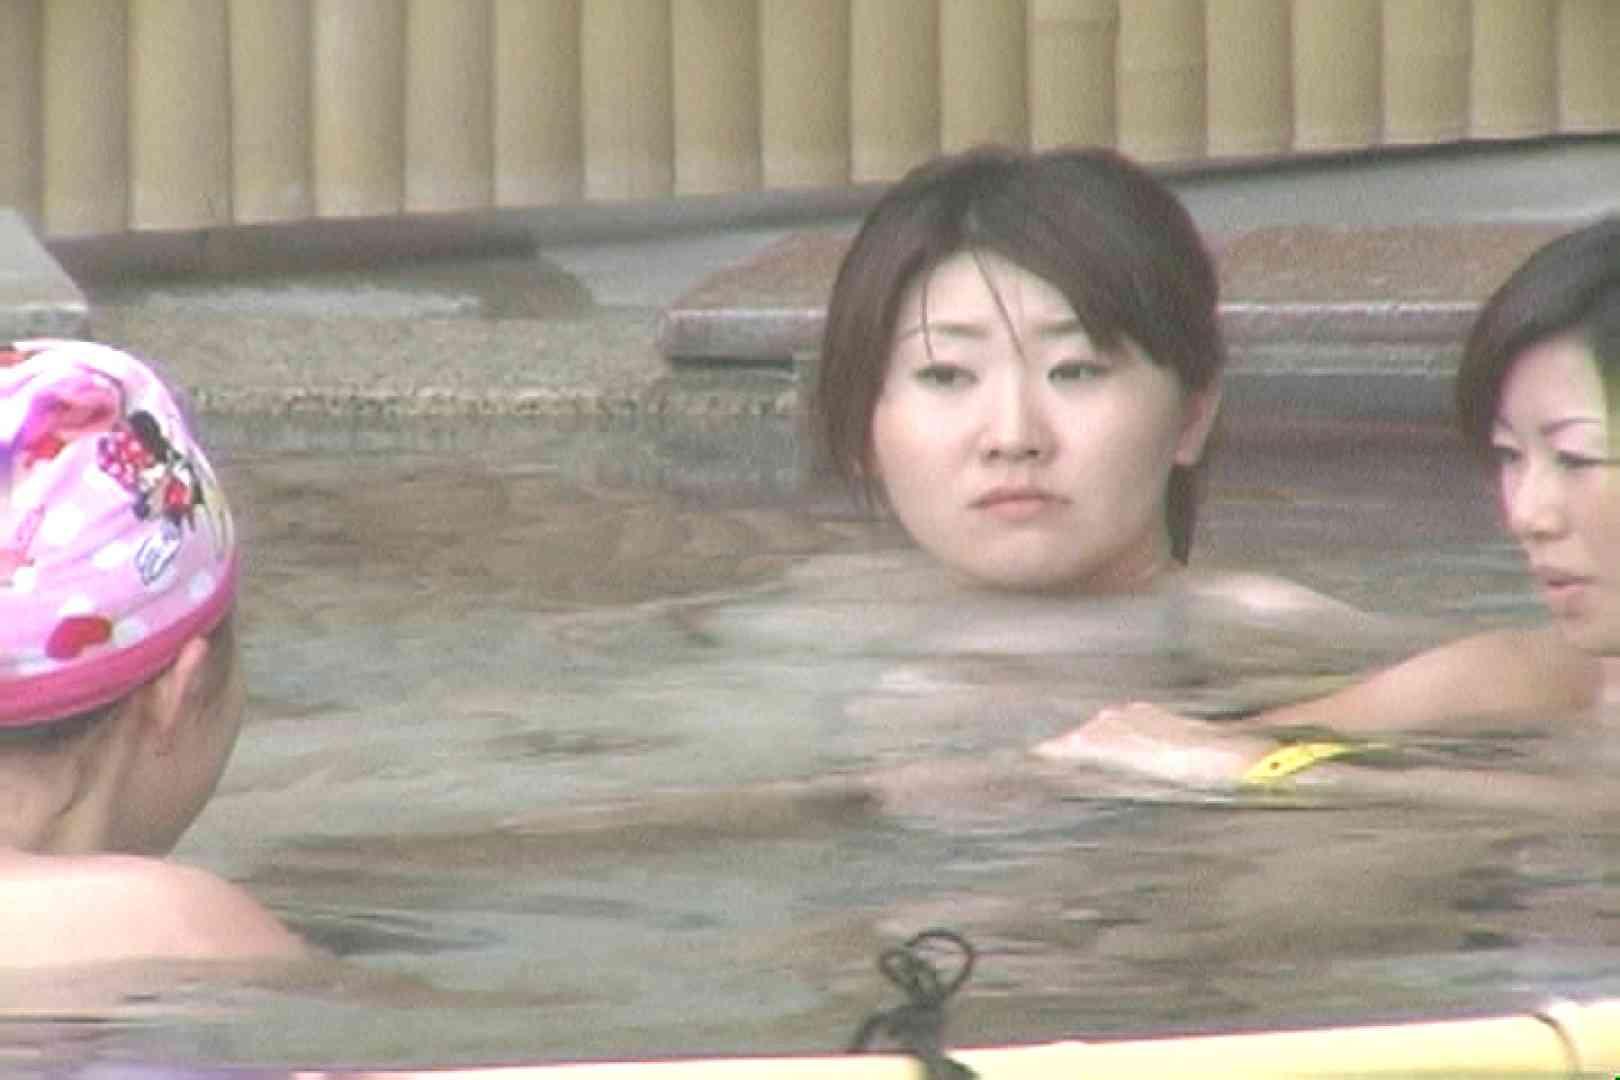 Aquaな露天風呂Vol.25 美しいOLの裸体 おまんこ無修正動画無料 72pic 65